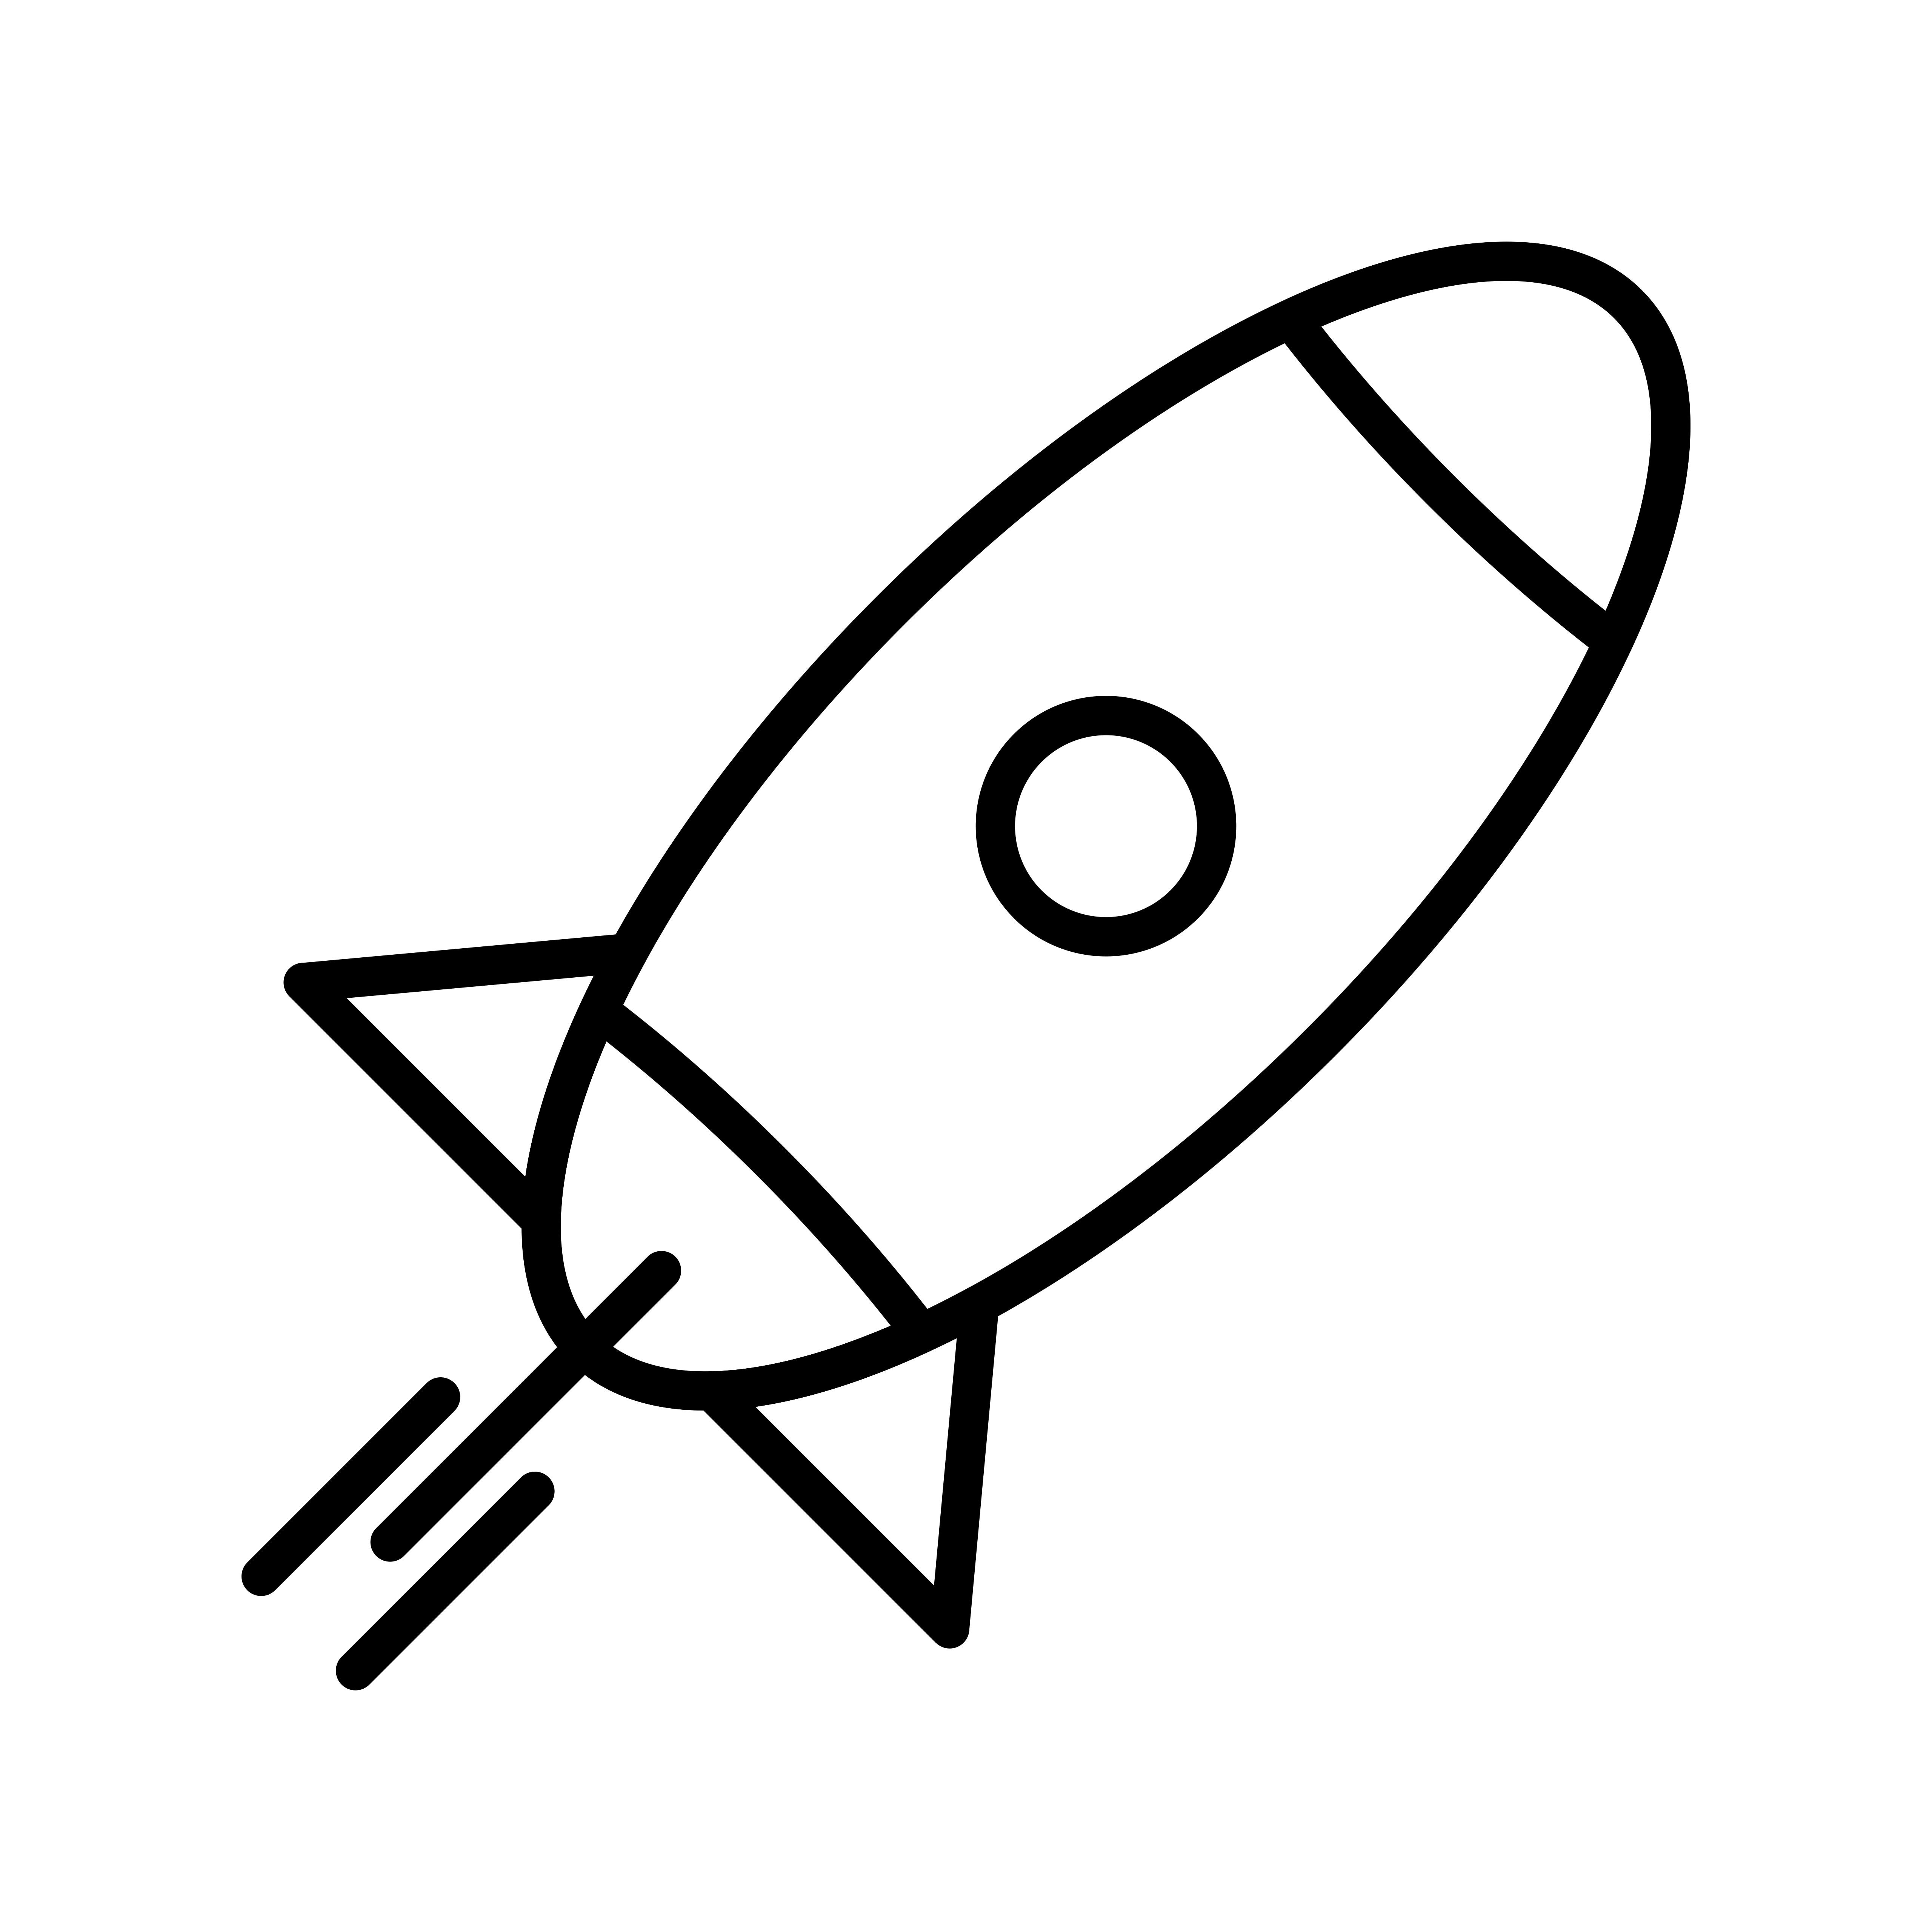 Rocket Line Black Icon